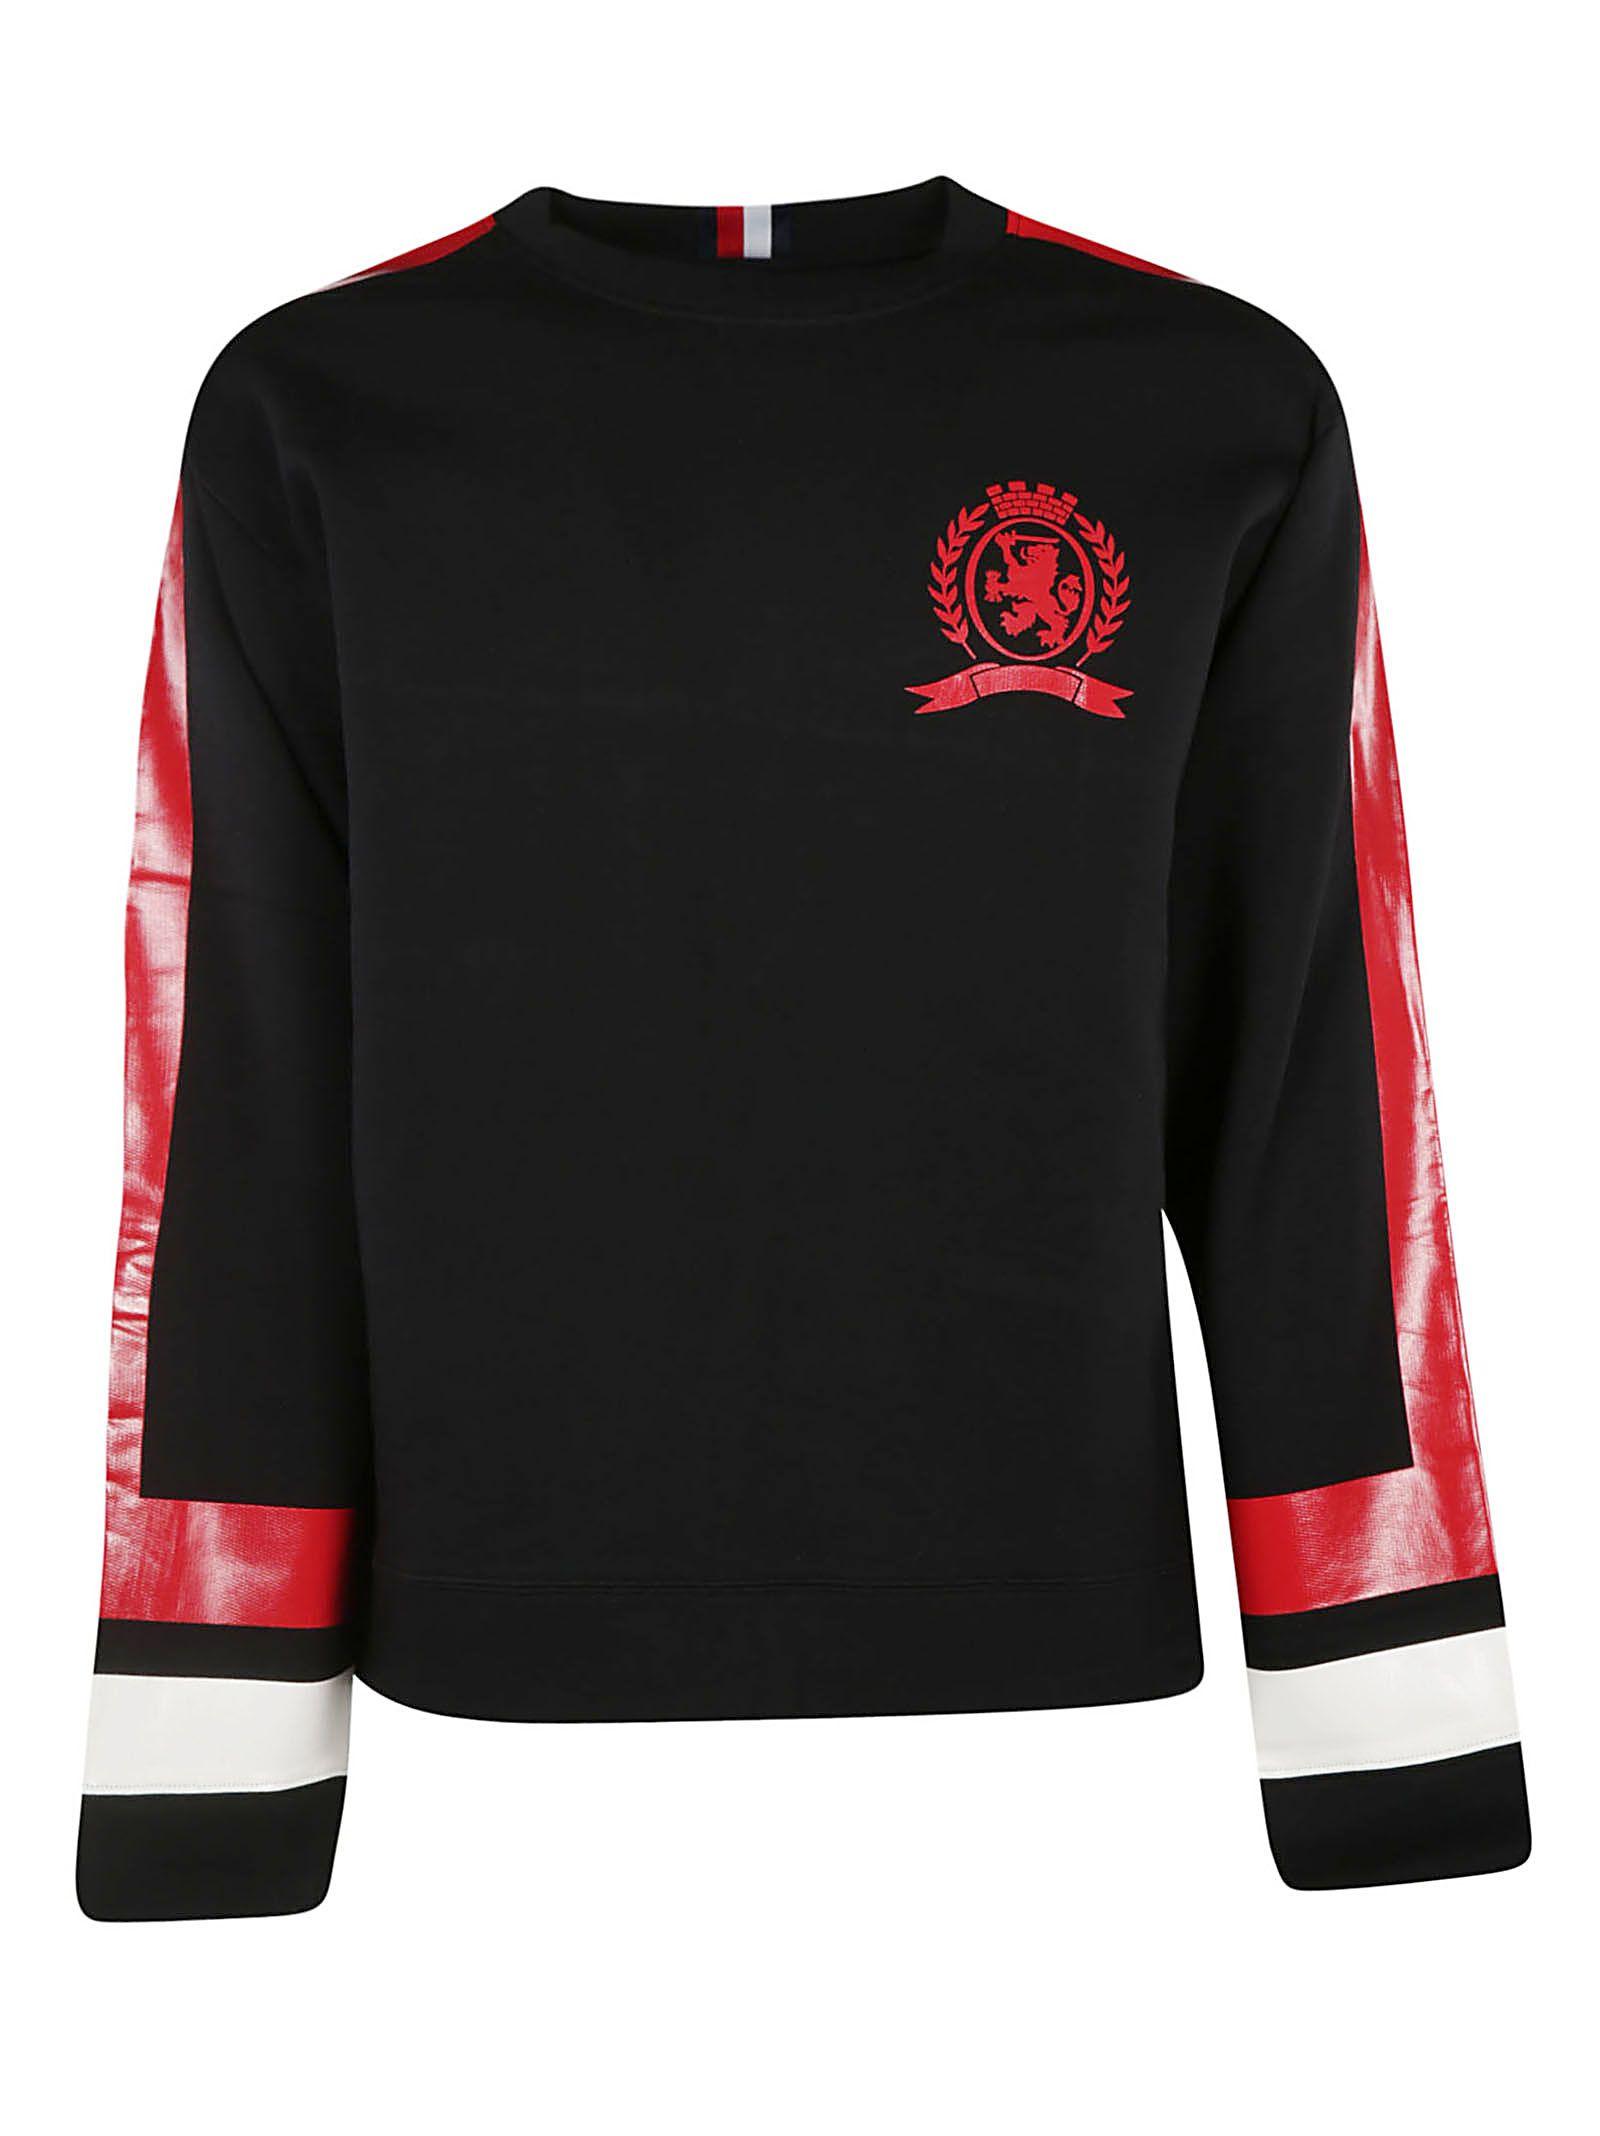 89a14d62dec Tommy Hilfiger Tommy Hilfiger Striped Sweatshirt - Jet Black ...